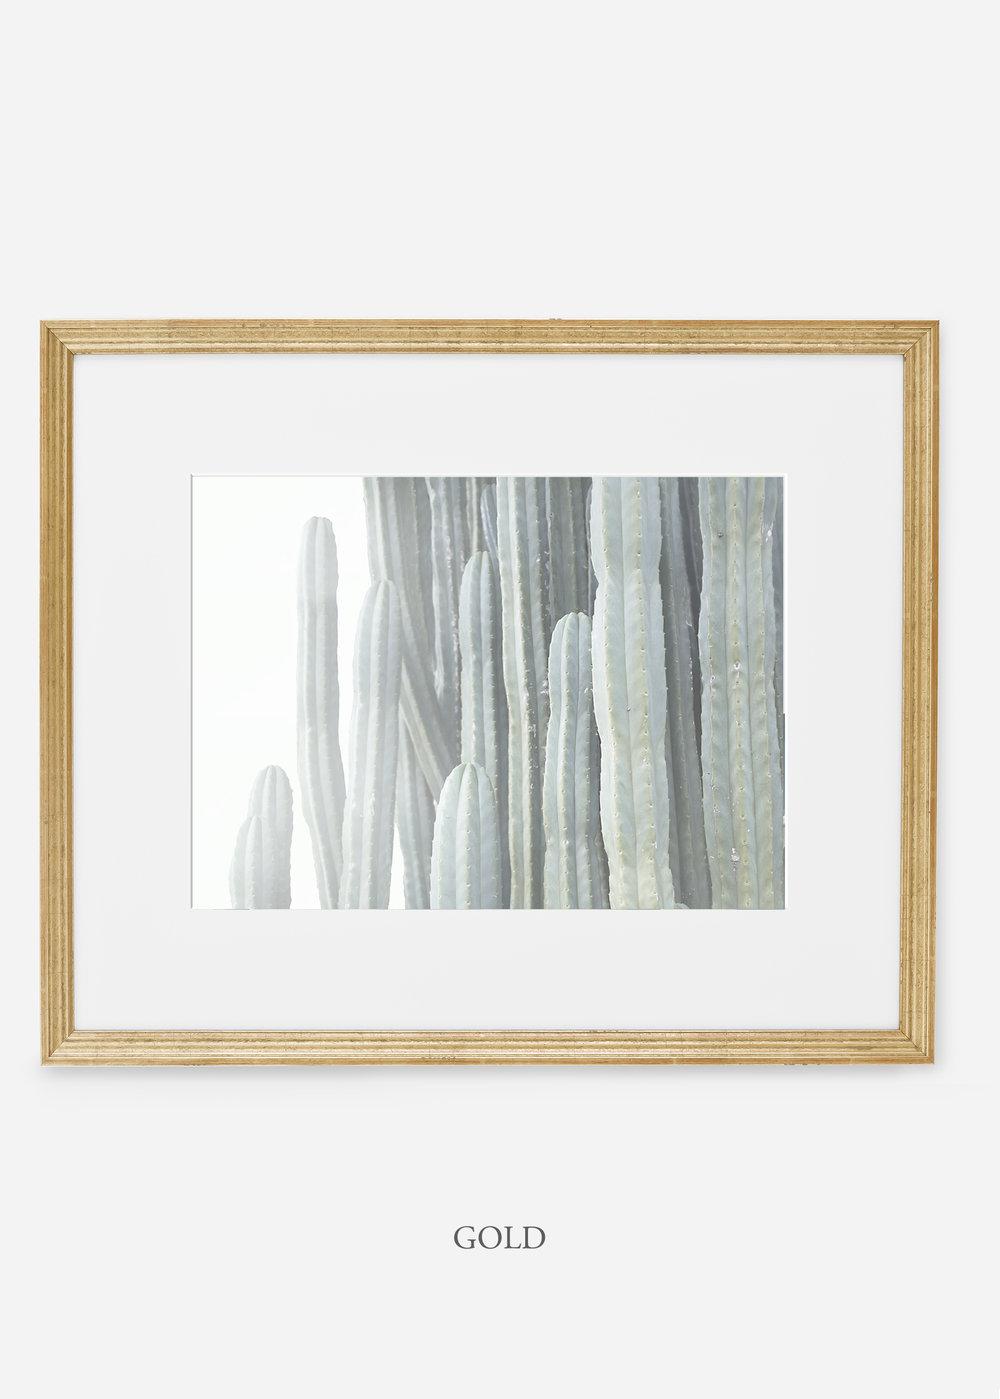 WilderCalifornia_goldframe__Cactus_Art_Photography_interiordesign_white_bohemian_neutral_photography_photo.jpg